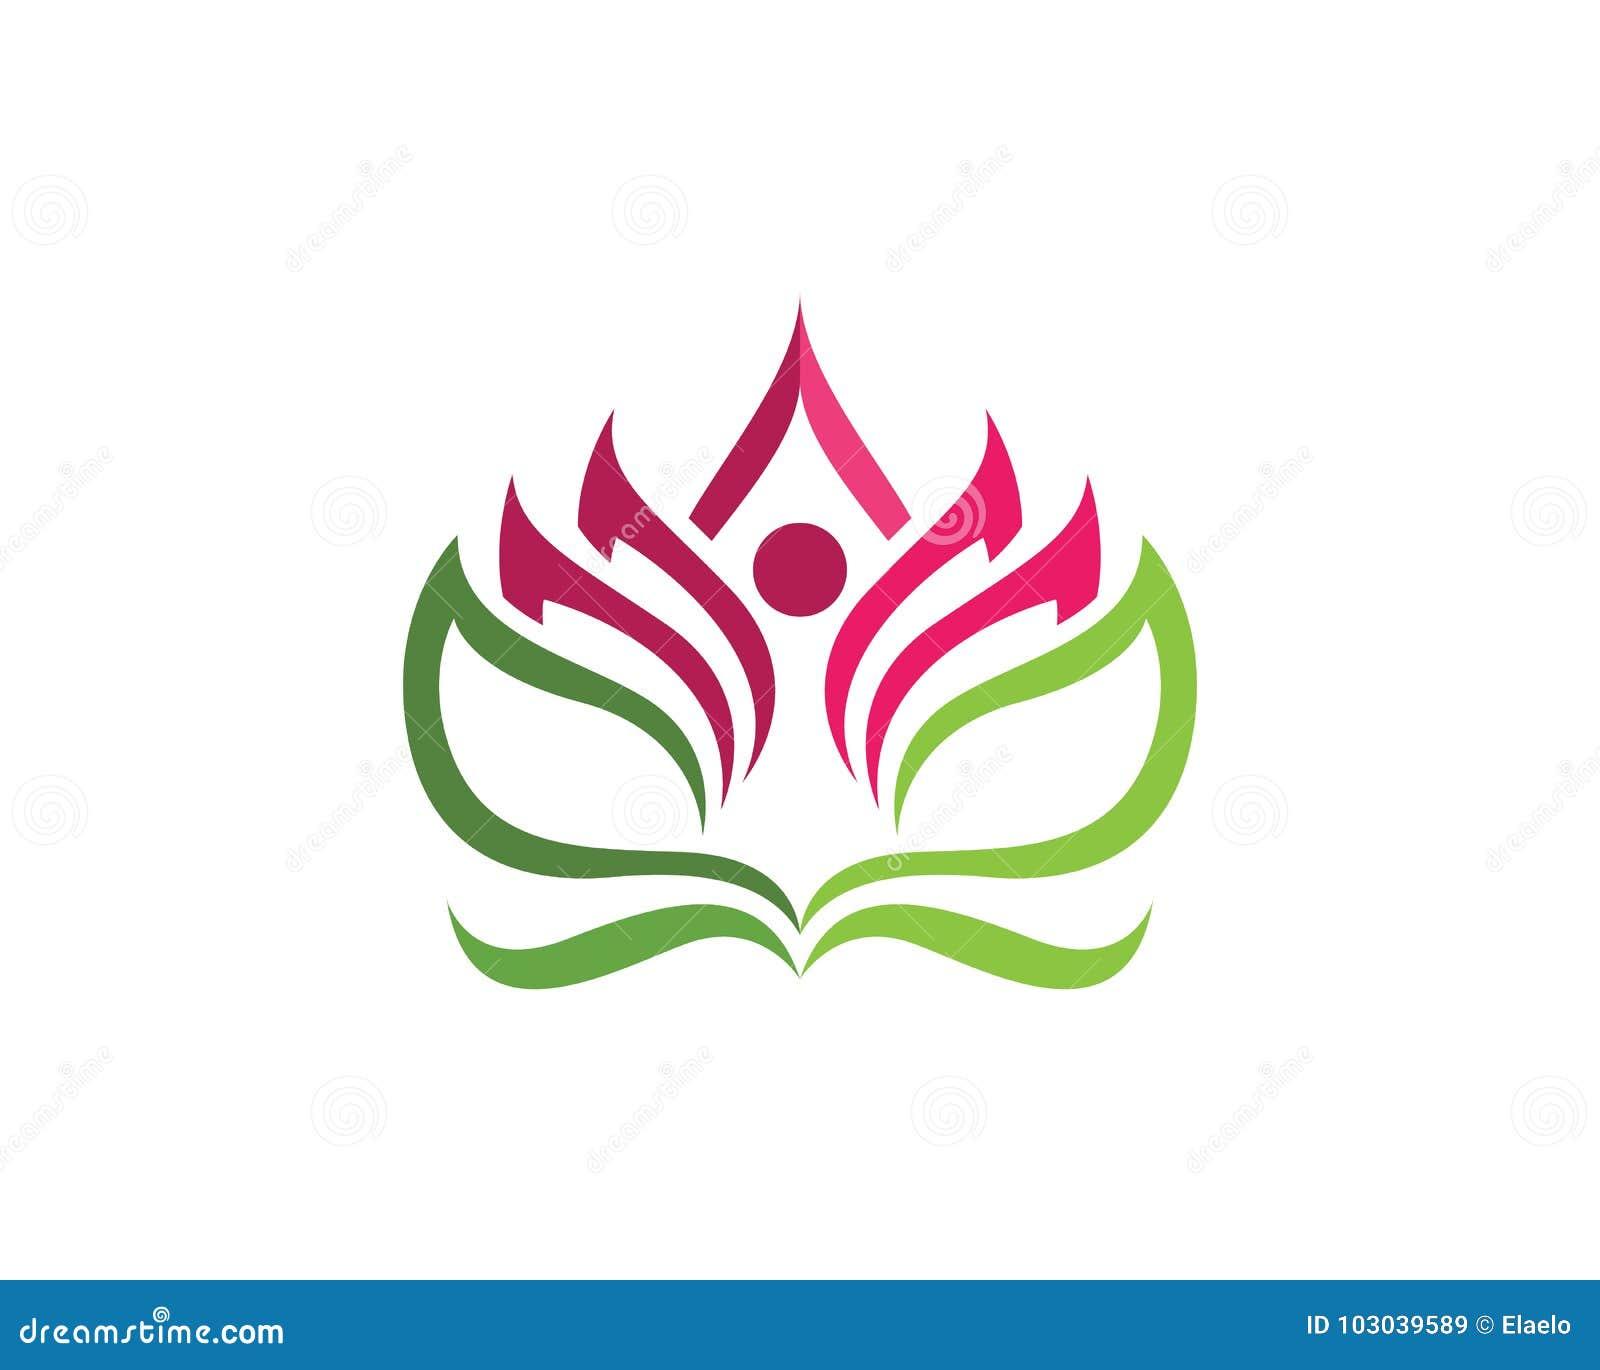 beauty lotus logo template stock illustration illustration of